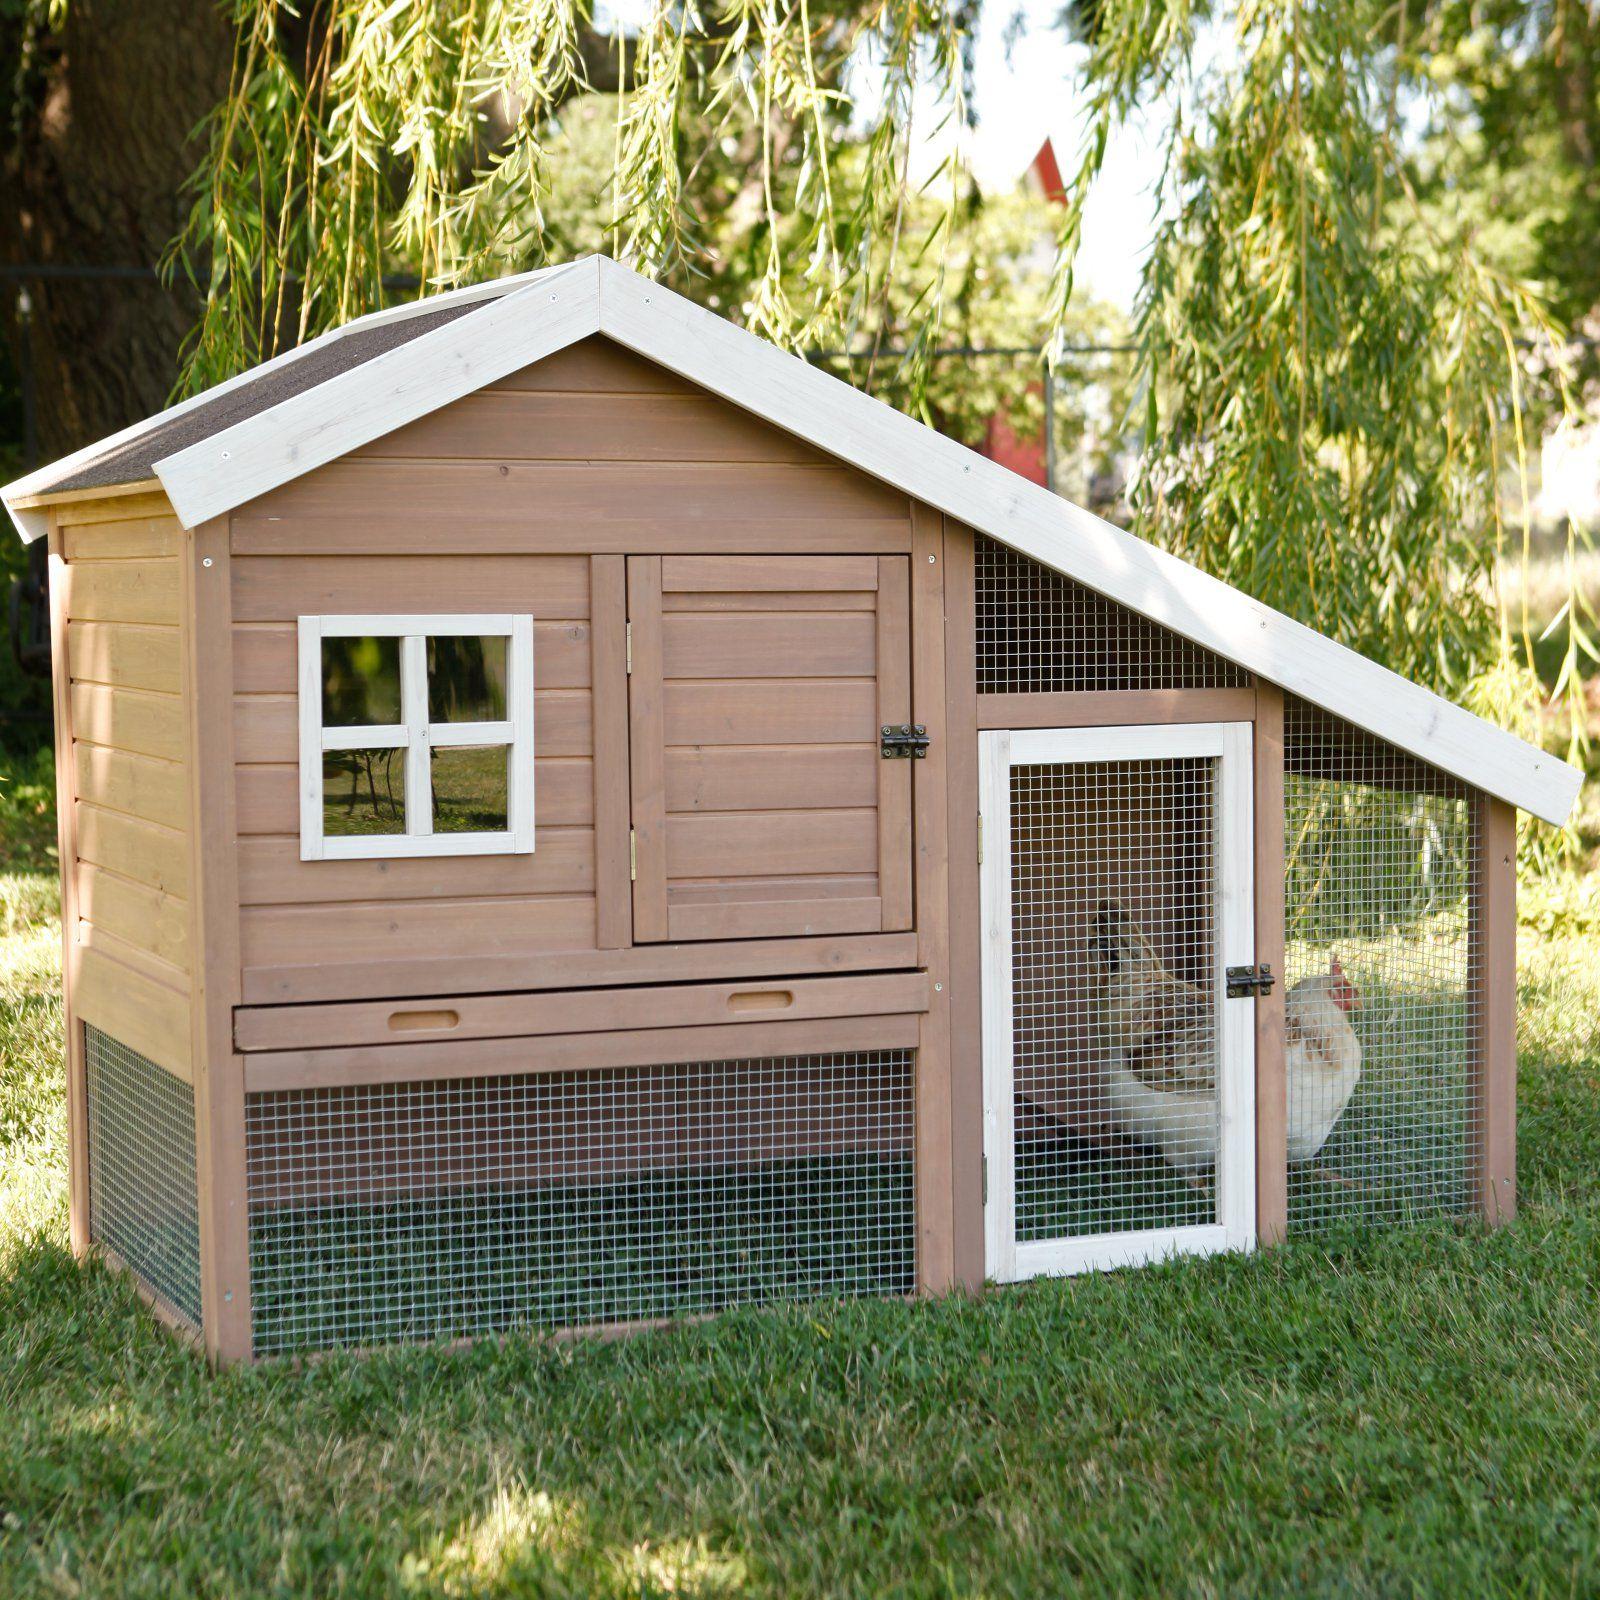 Pin By Ninji Ka On Huhner In 2021 Diy Chicken Coop Plans Building A Chicken Coop Best Chicken Coop Simple chicken house design for backyard farming